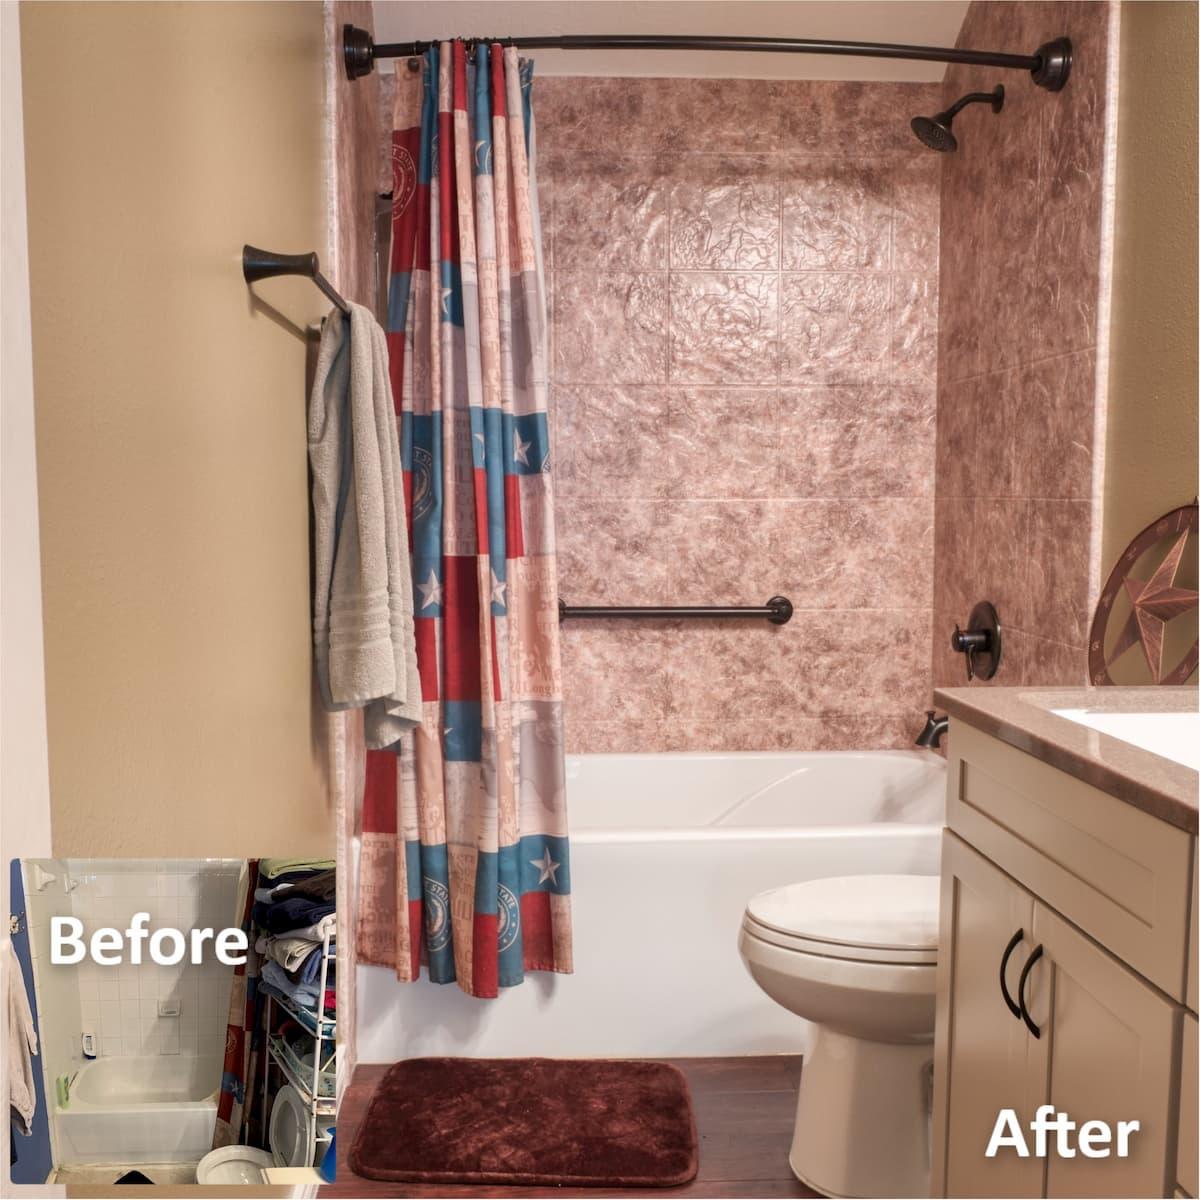 full bathroom remodel using karndean flooring and BCI acrylic bathtub and wall surround